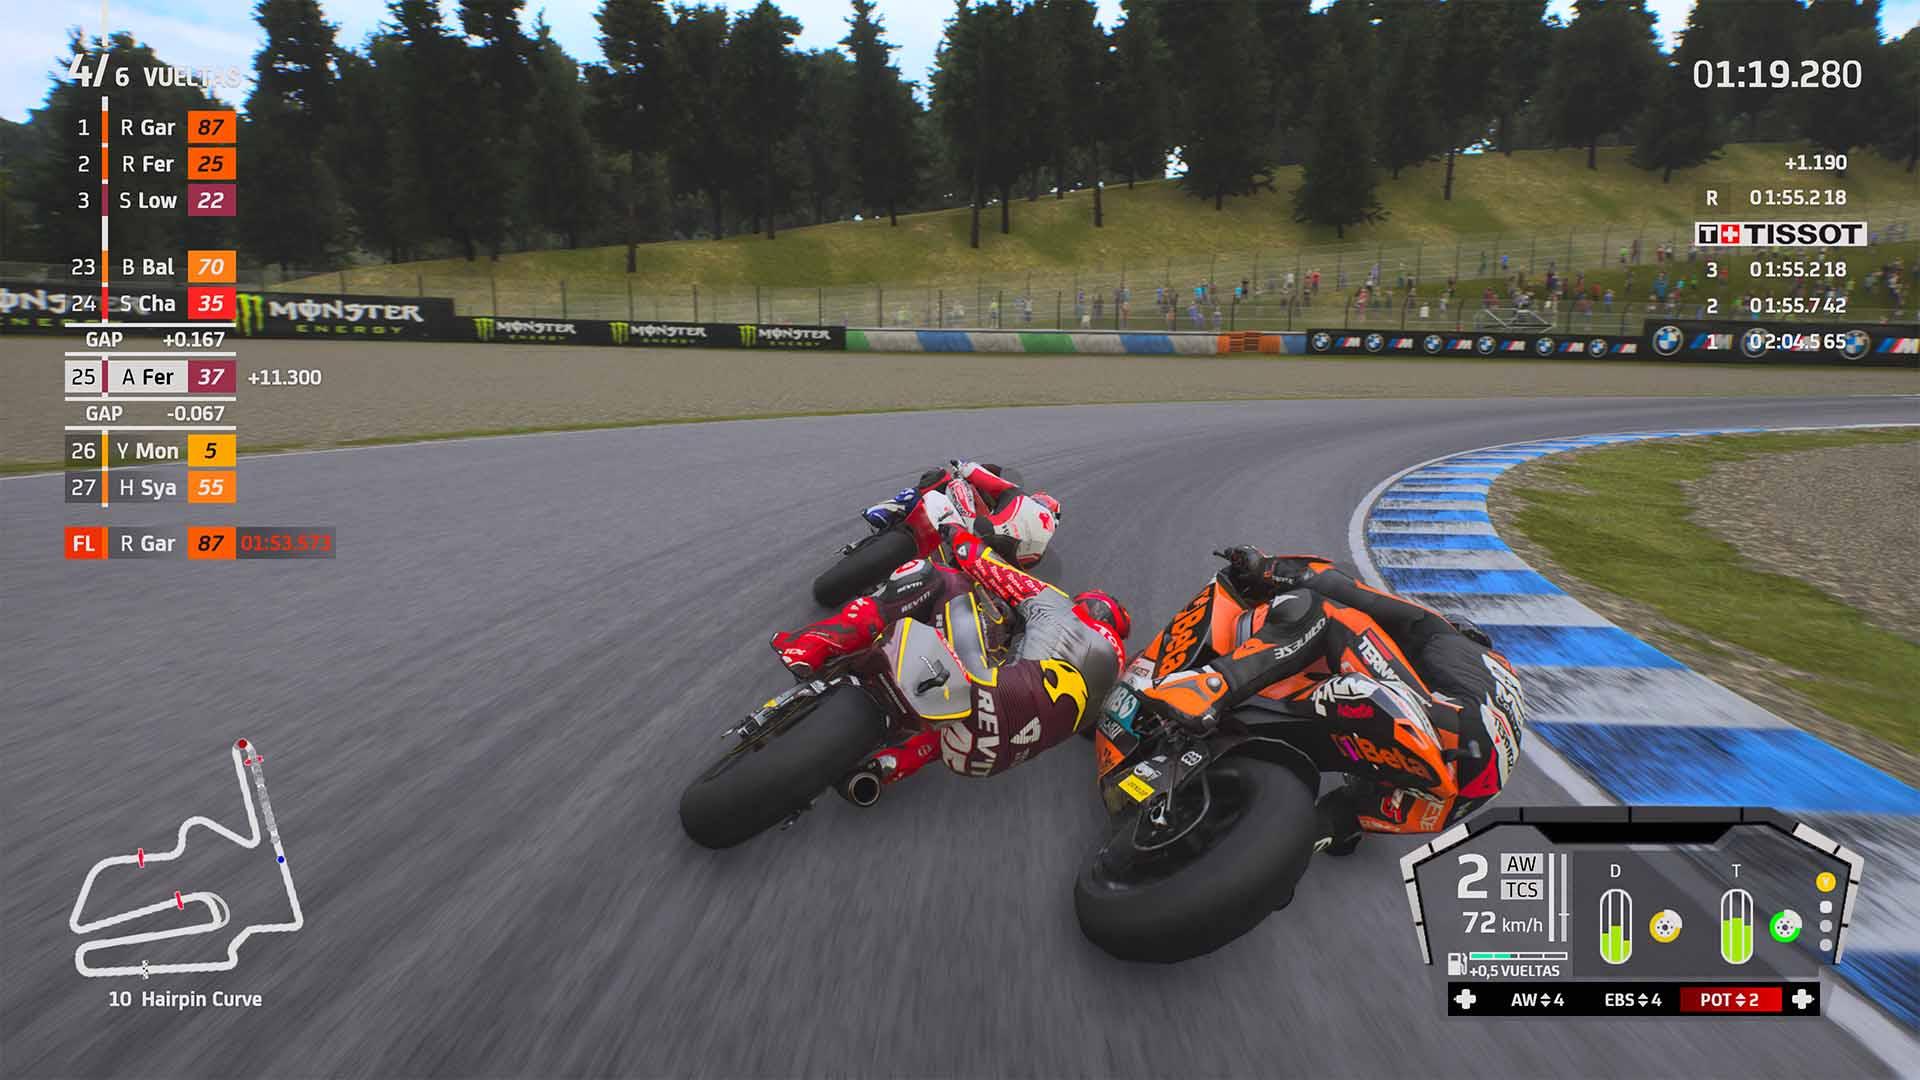 Análisis de MotoGP 21 - Xbox Series X 8